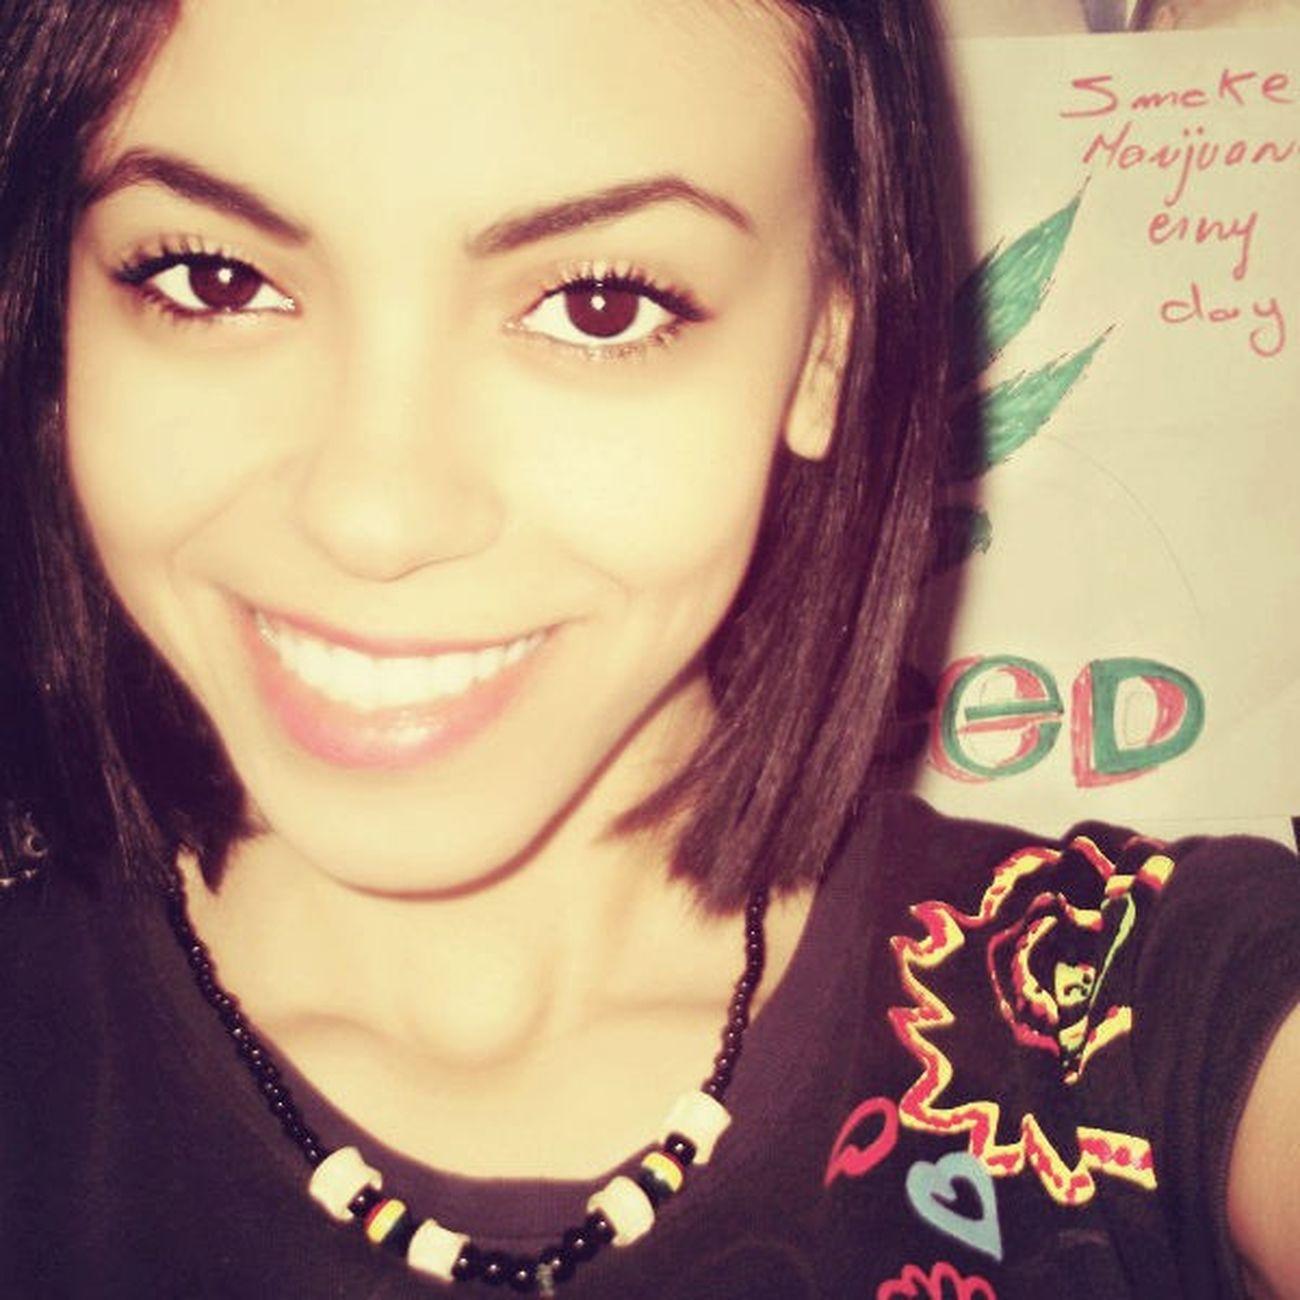 Gdmorning Blessedday ArabBeauty Tunisianbeauty instagirl eyes brune brownsugar peace @charmingfacesintunisia